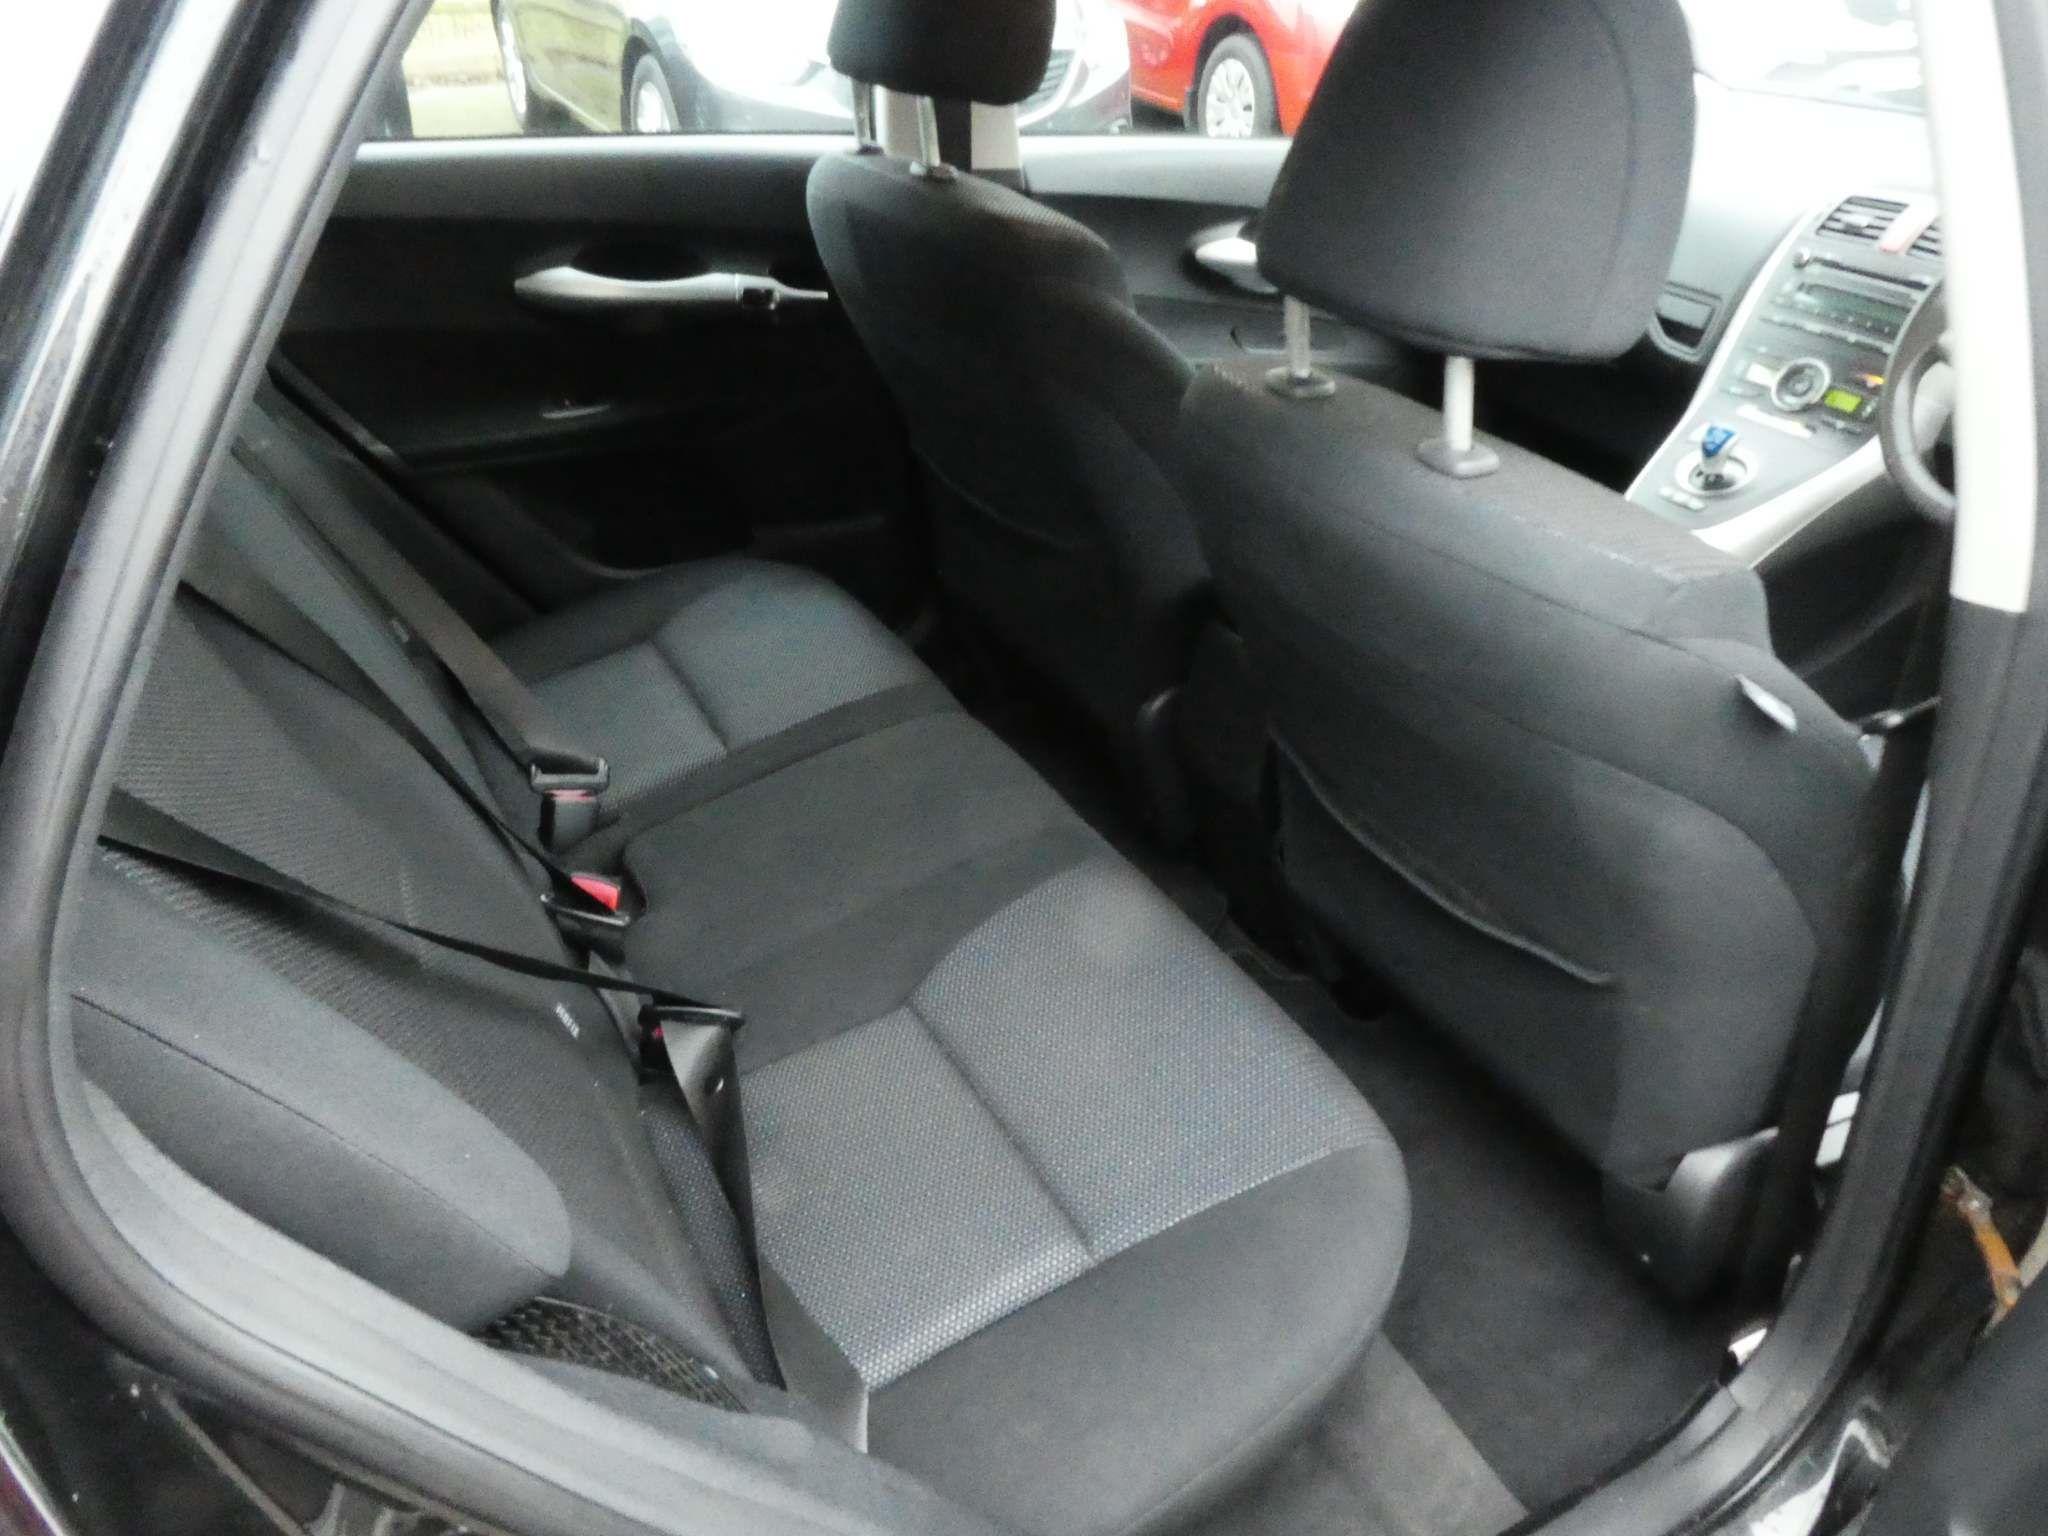 2011 TOYOTA Auris 1.8 T4 CVT Hybrid – Petrol/Electric Automatic only 65000 miles full history – FC Motors 52 Carntall Rd, Newtownabbey BT36 5SD full